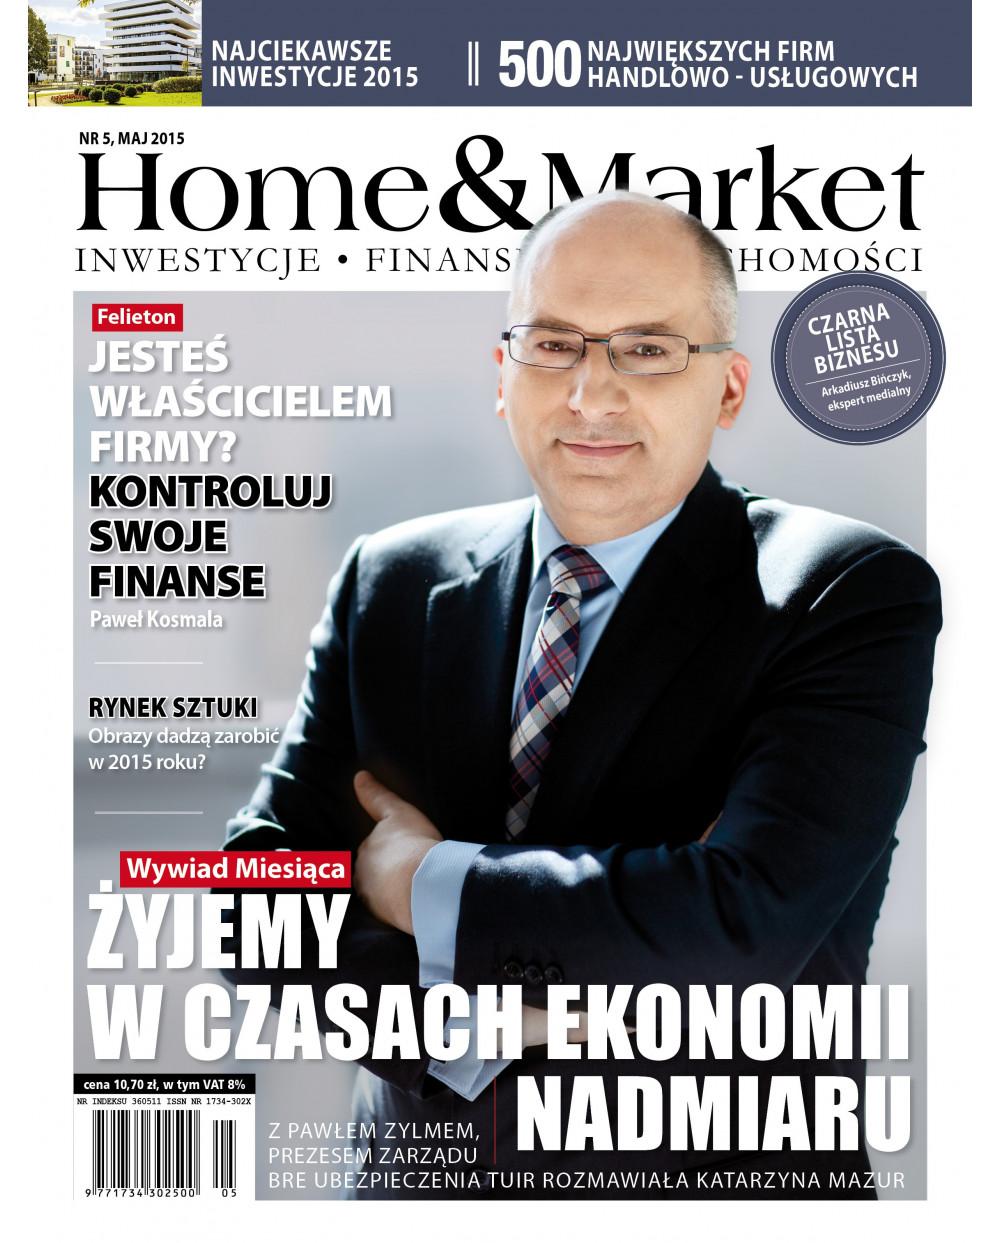 Home&Market 5/2015